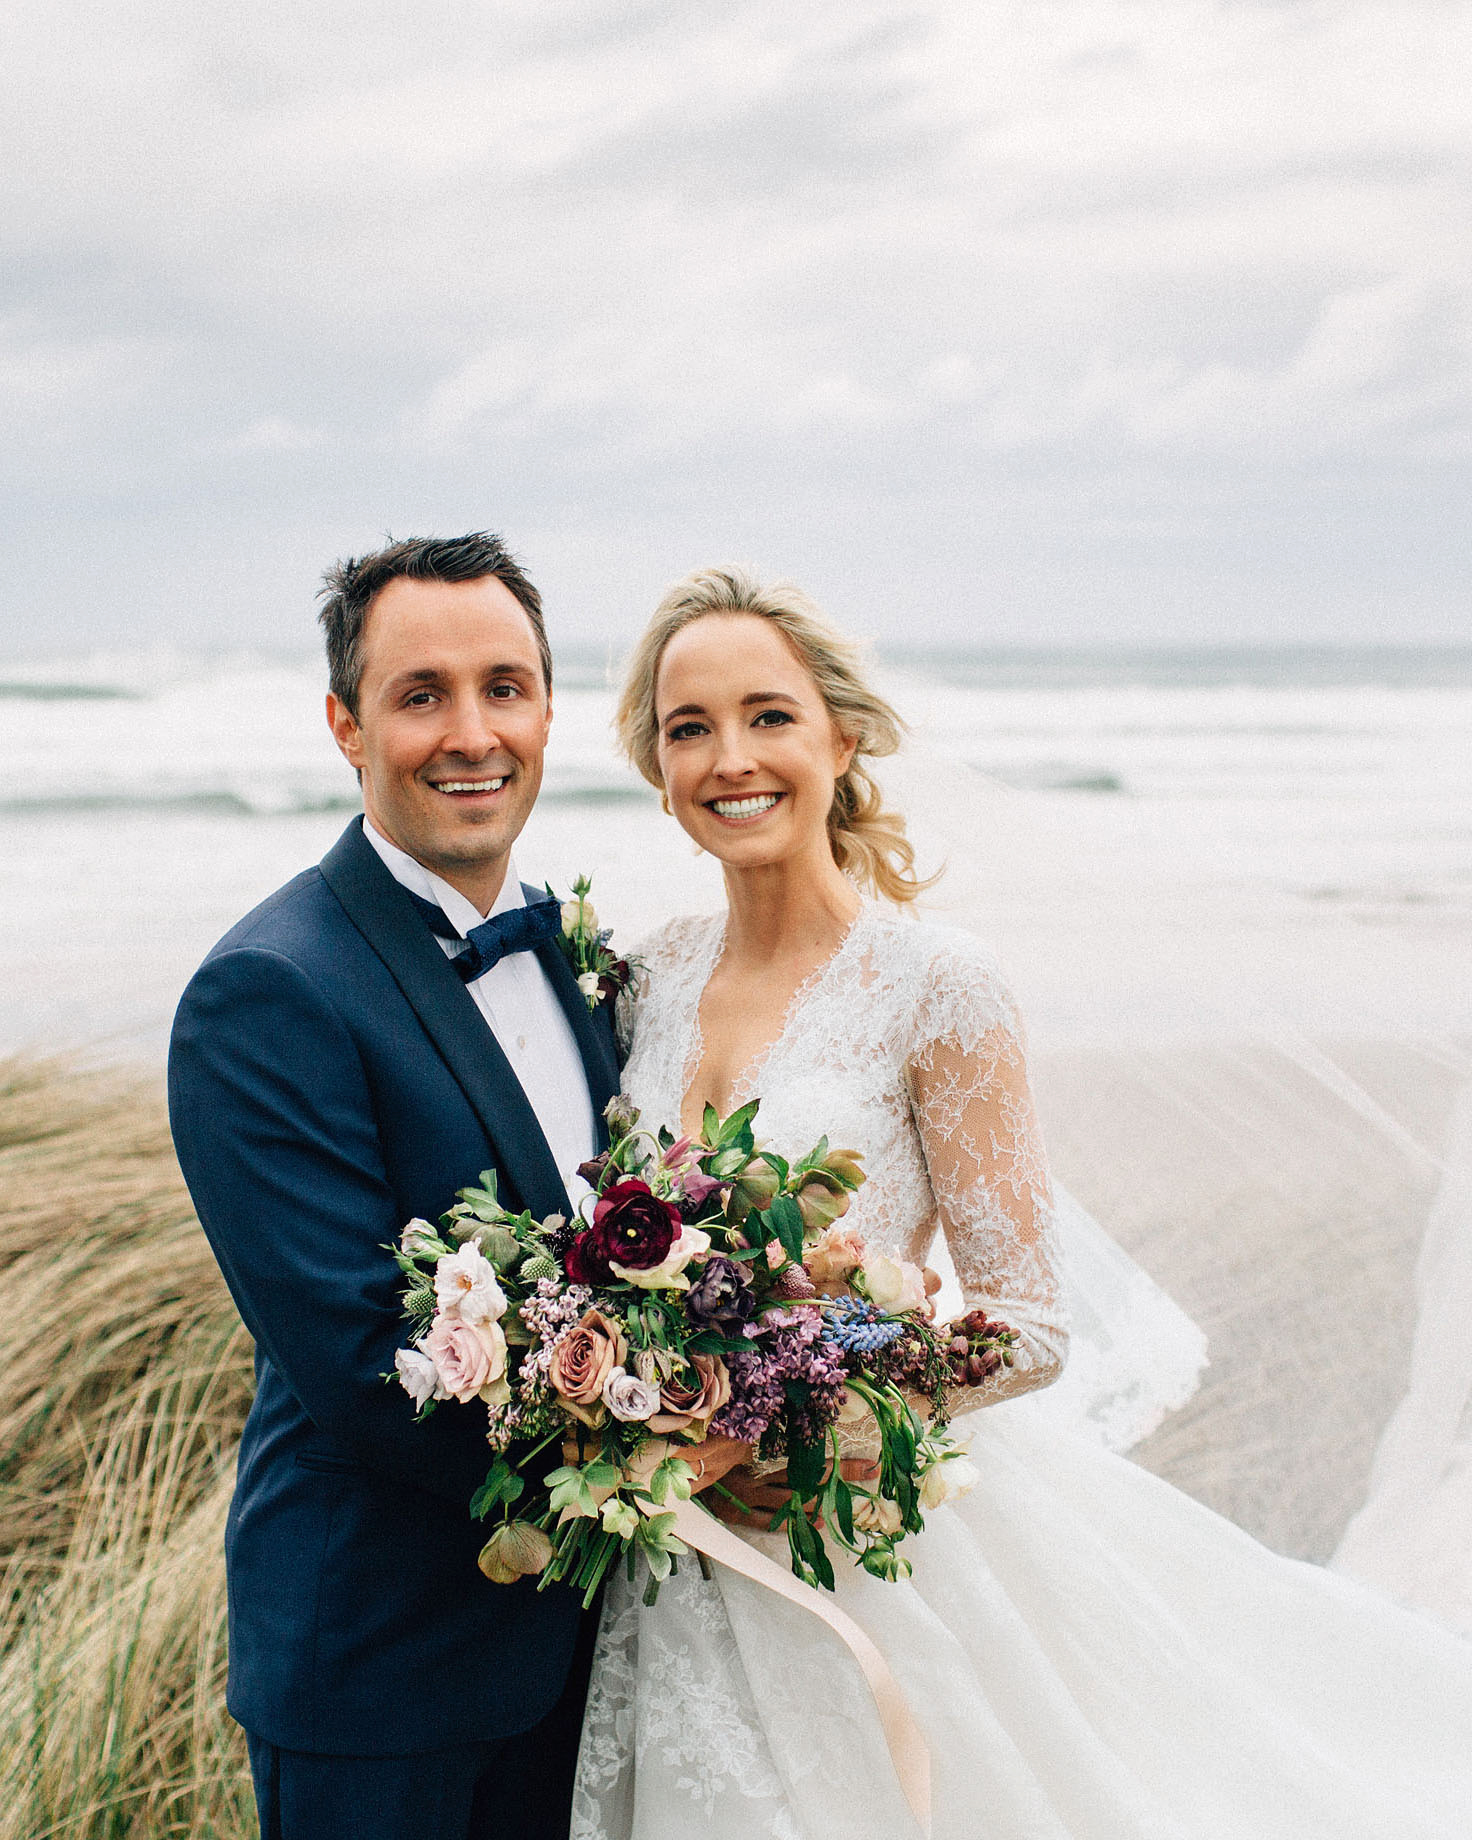 simone darren wedding ireland couple